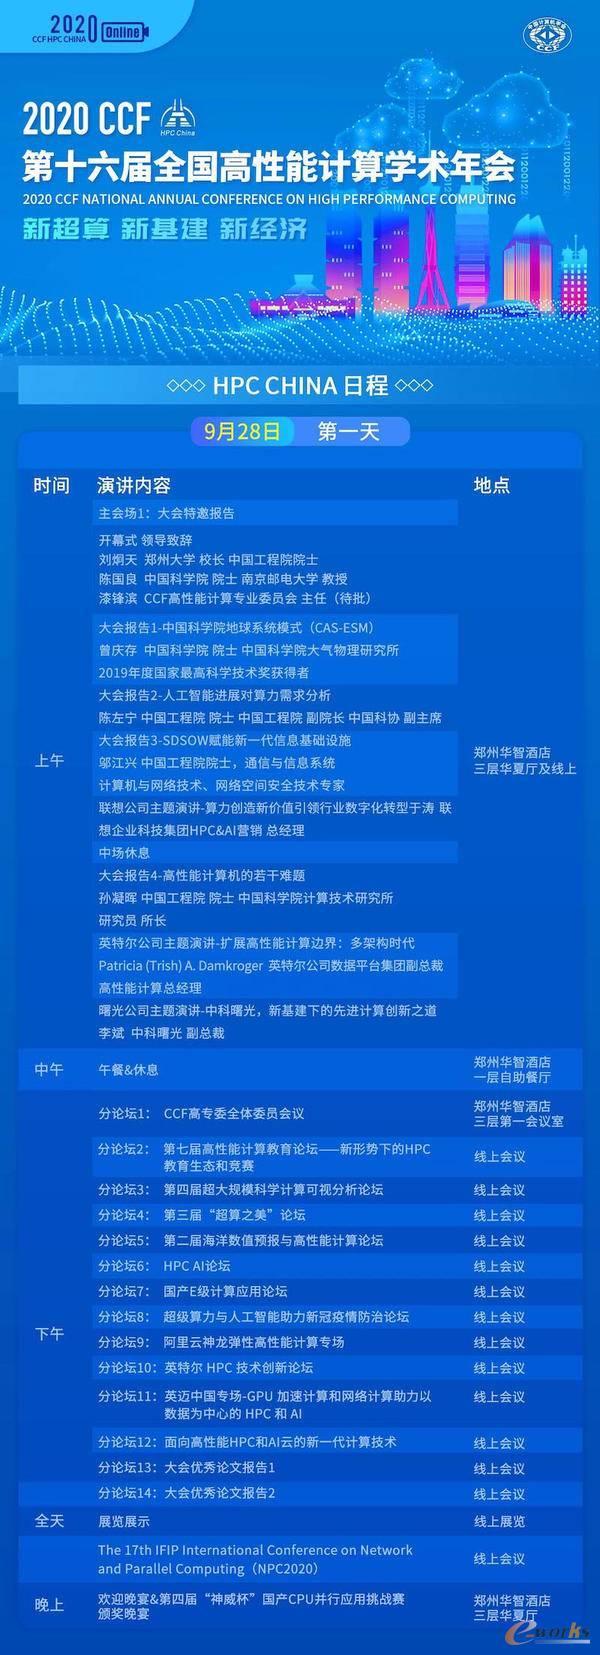 http://www.e-works.net.cn/News/articleimage/20209/132452341990039380_new.jpg